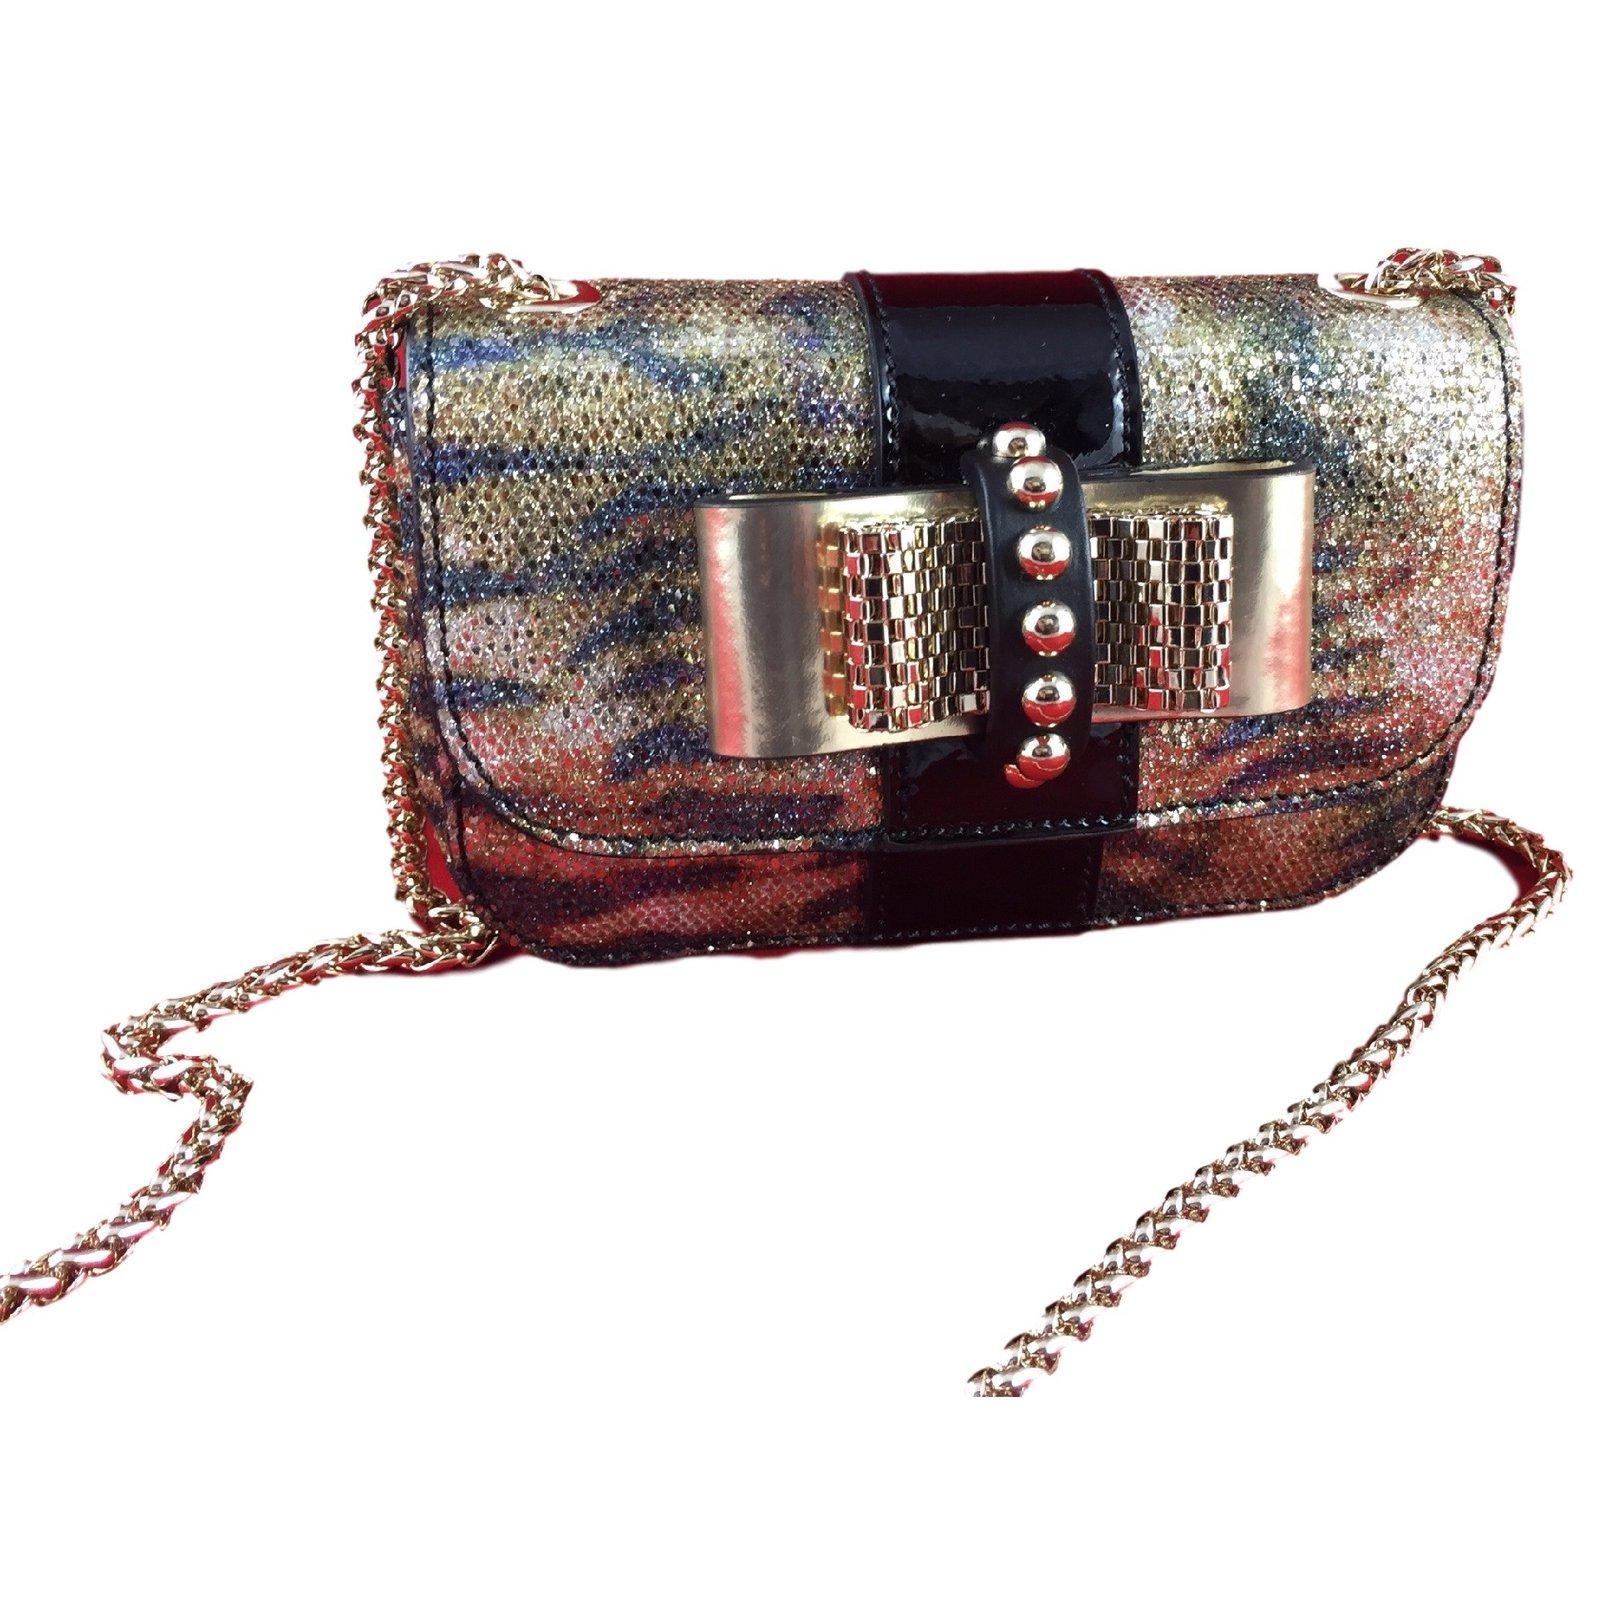 Louboutin Sweet Charity Lizard Handbags Leather Python Print Ref 19102